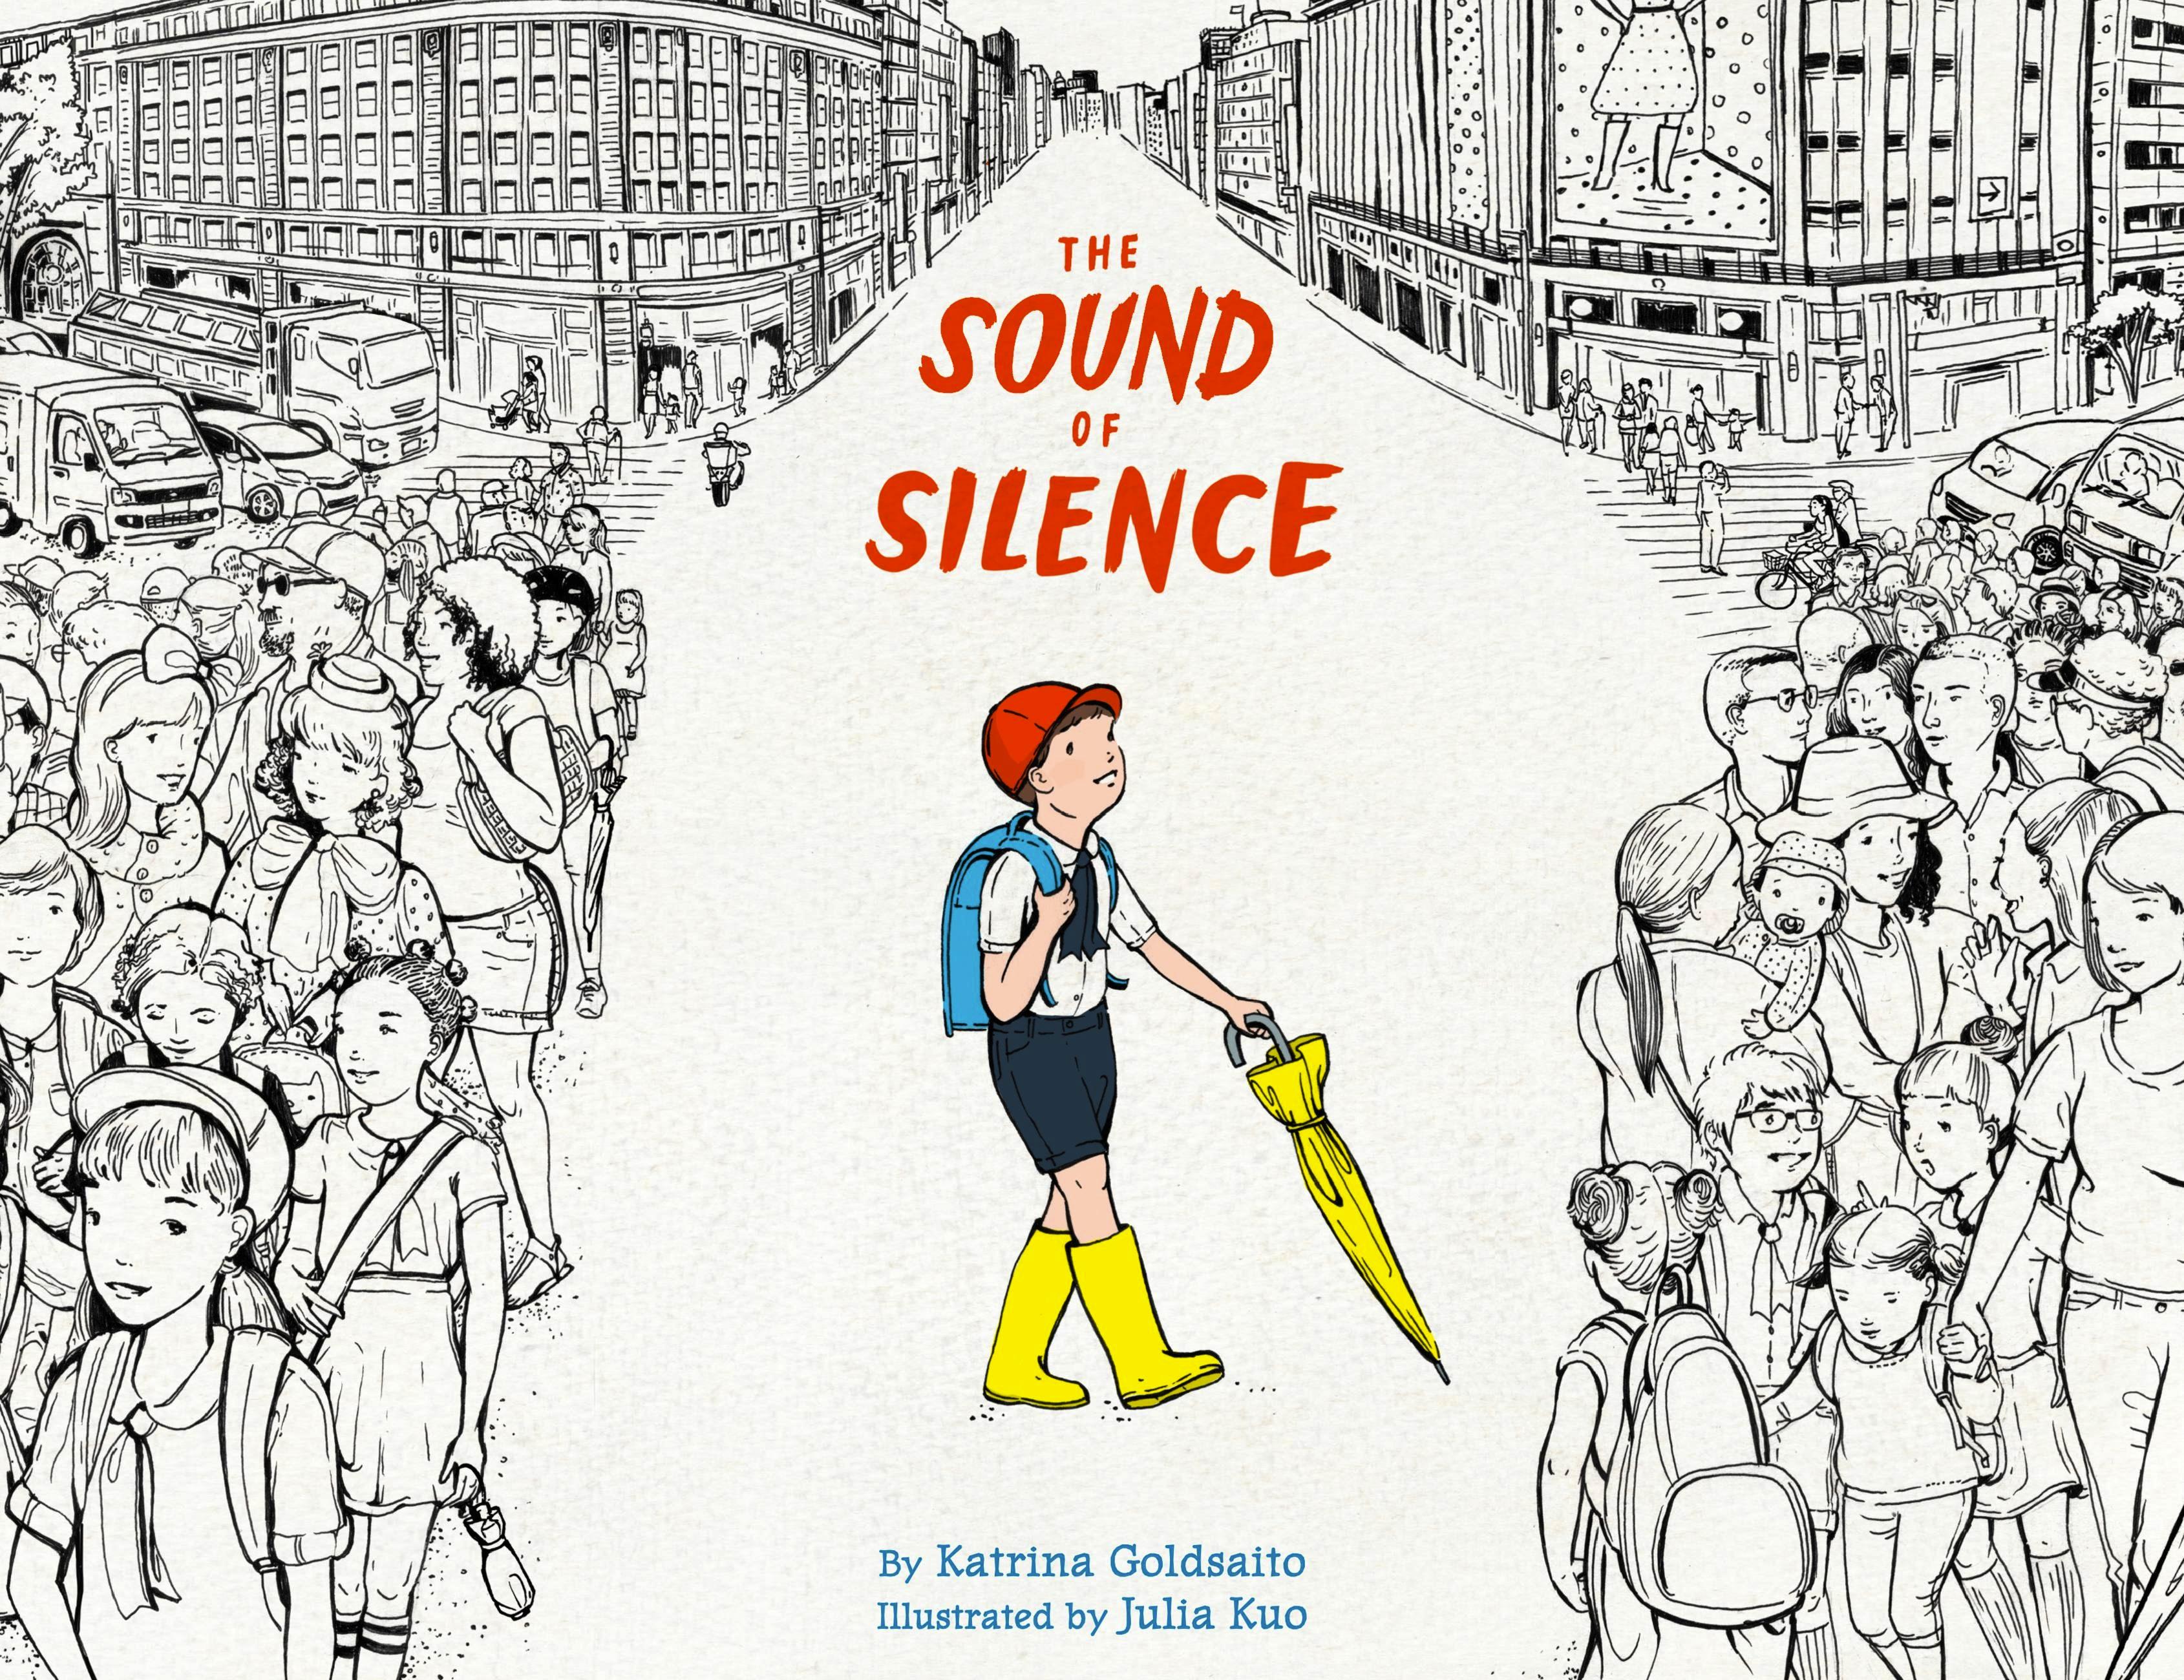 The Sound of Silence by Katrina Goldsaito | Hachette Book ...